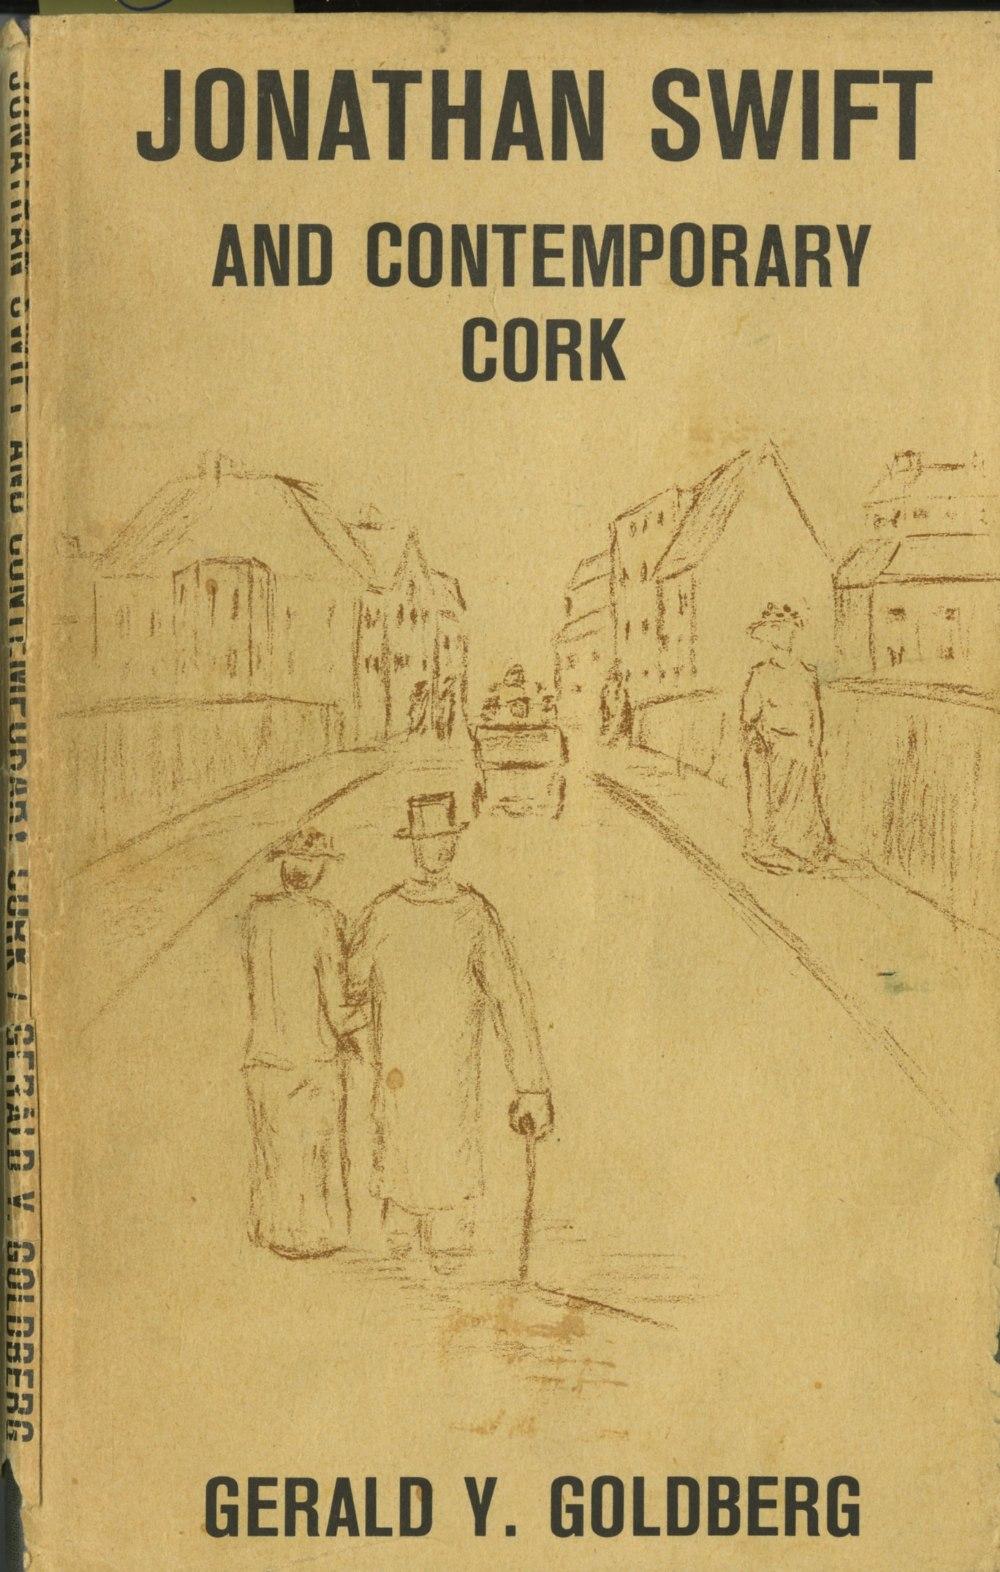 Goldberg (Gerald Y.) Jonathan Swift and Contemporary Cork, 8vo Cork (Mercier) 1967.